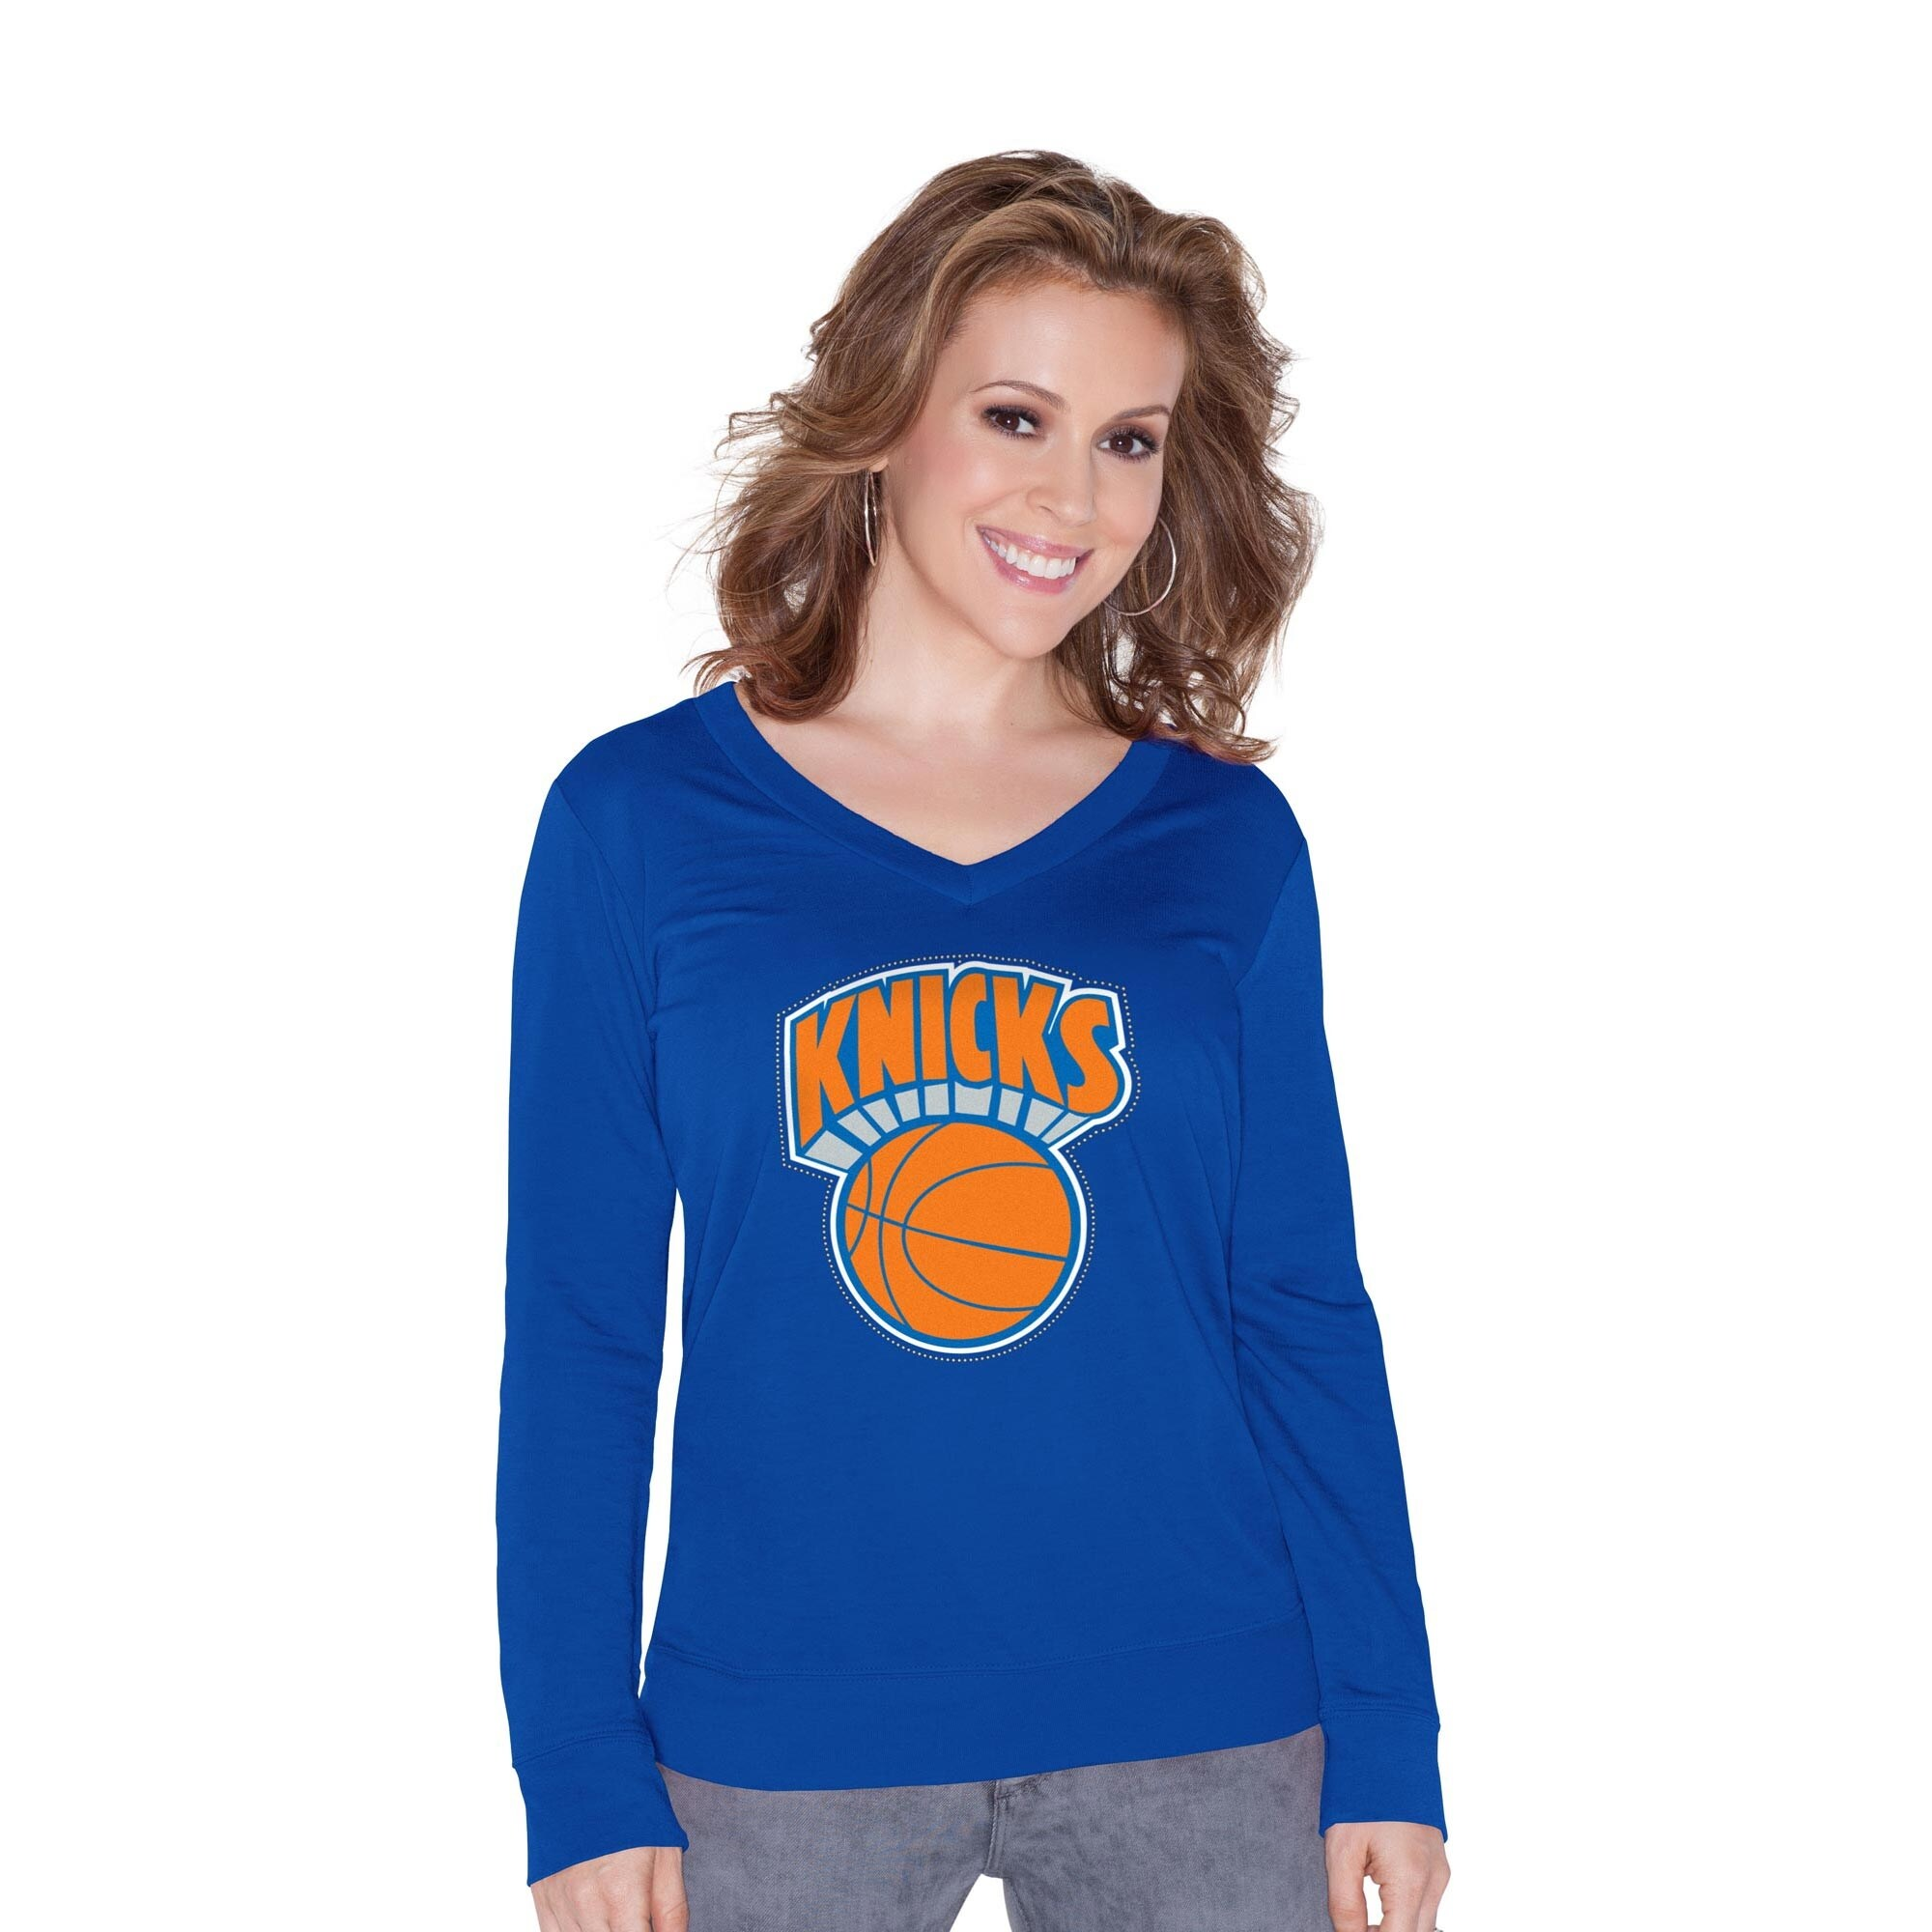 New York Knicks Touch by Alyssa Milano Womens Lana Fashion V-Neck Sweatshirt - Royal Blue